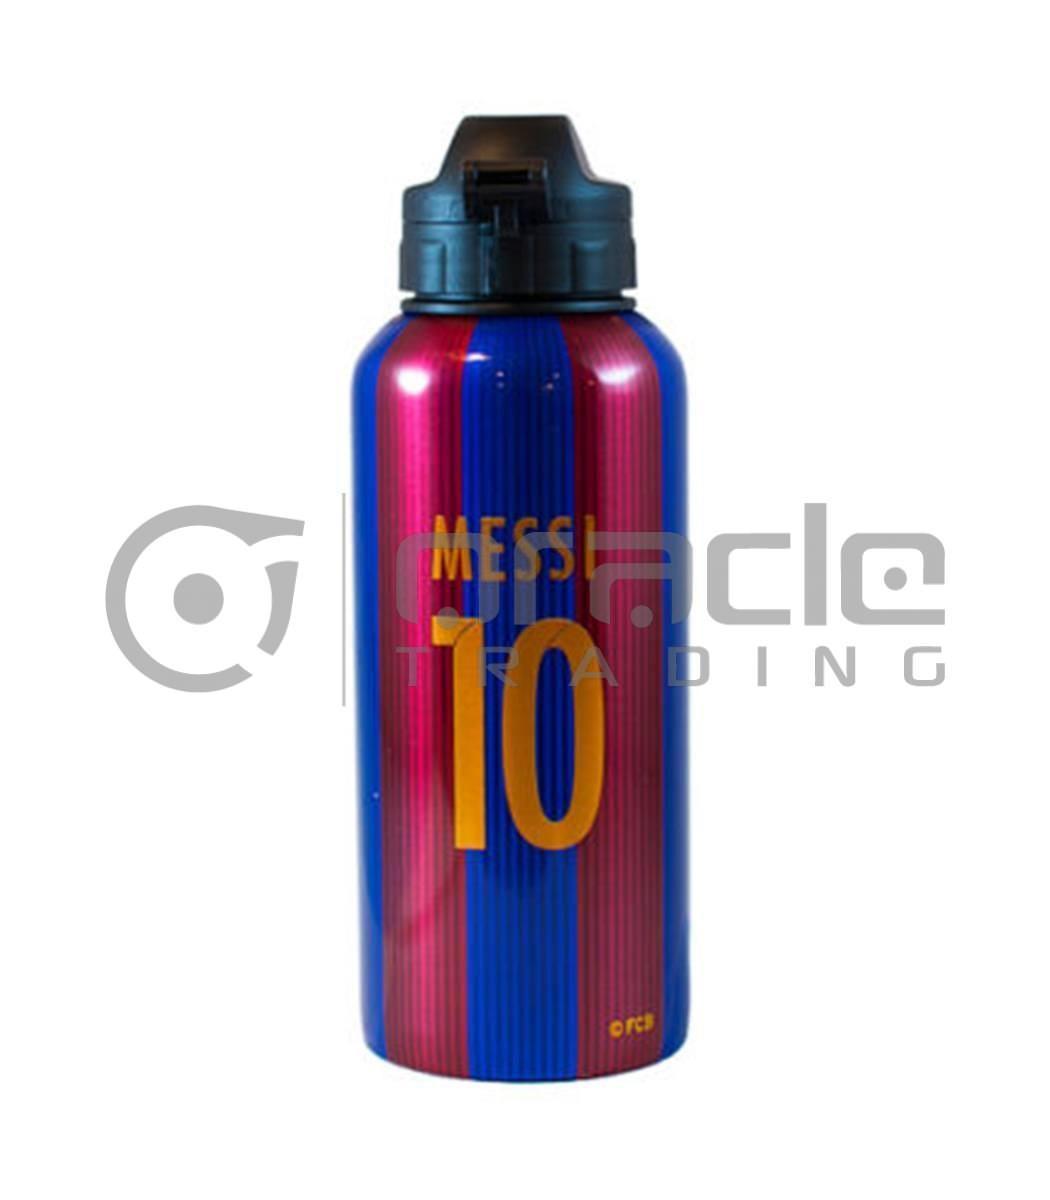 Messi Barcelona Aluminum Water Bottle (Signed)